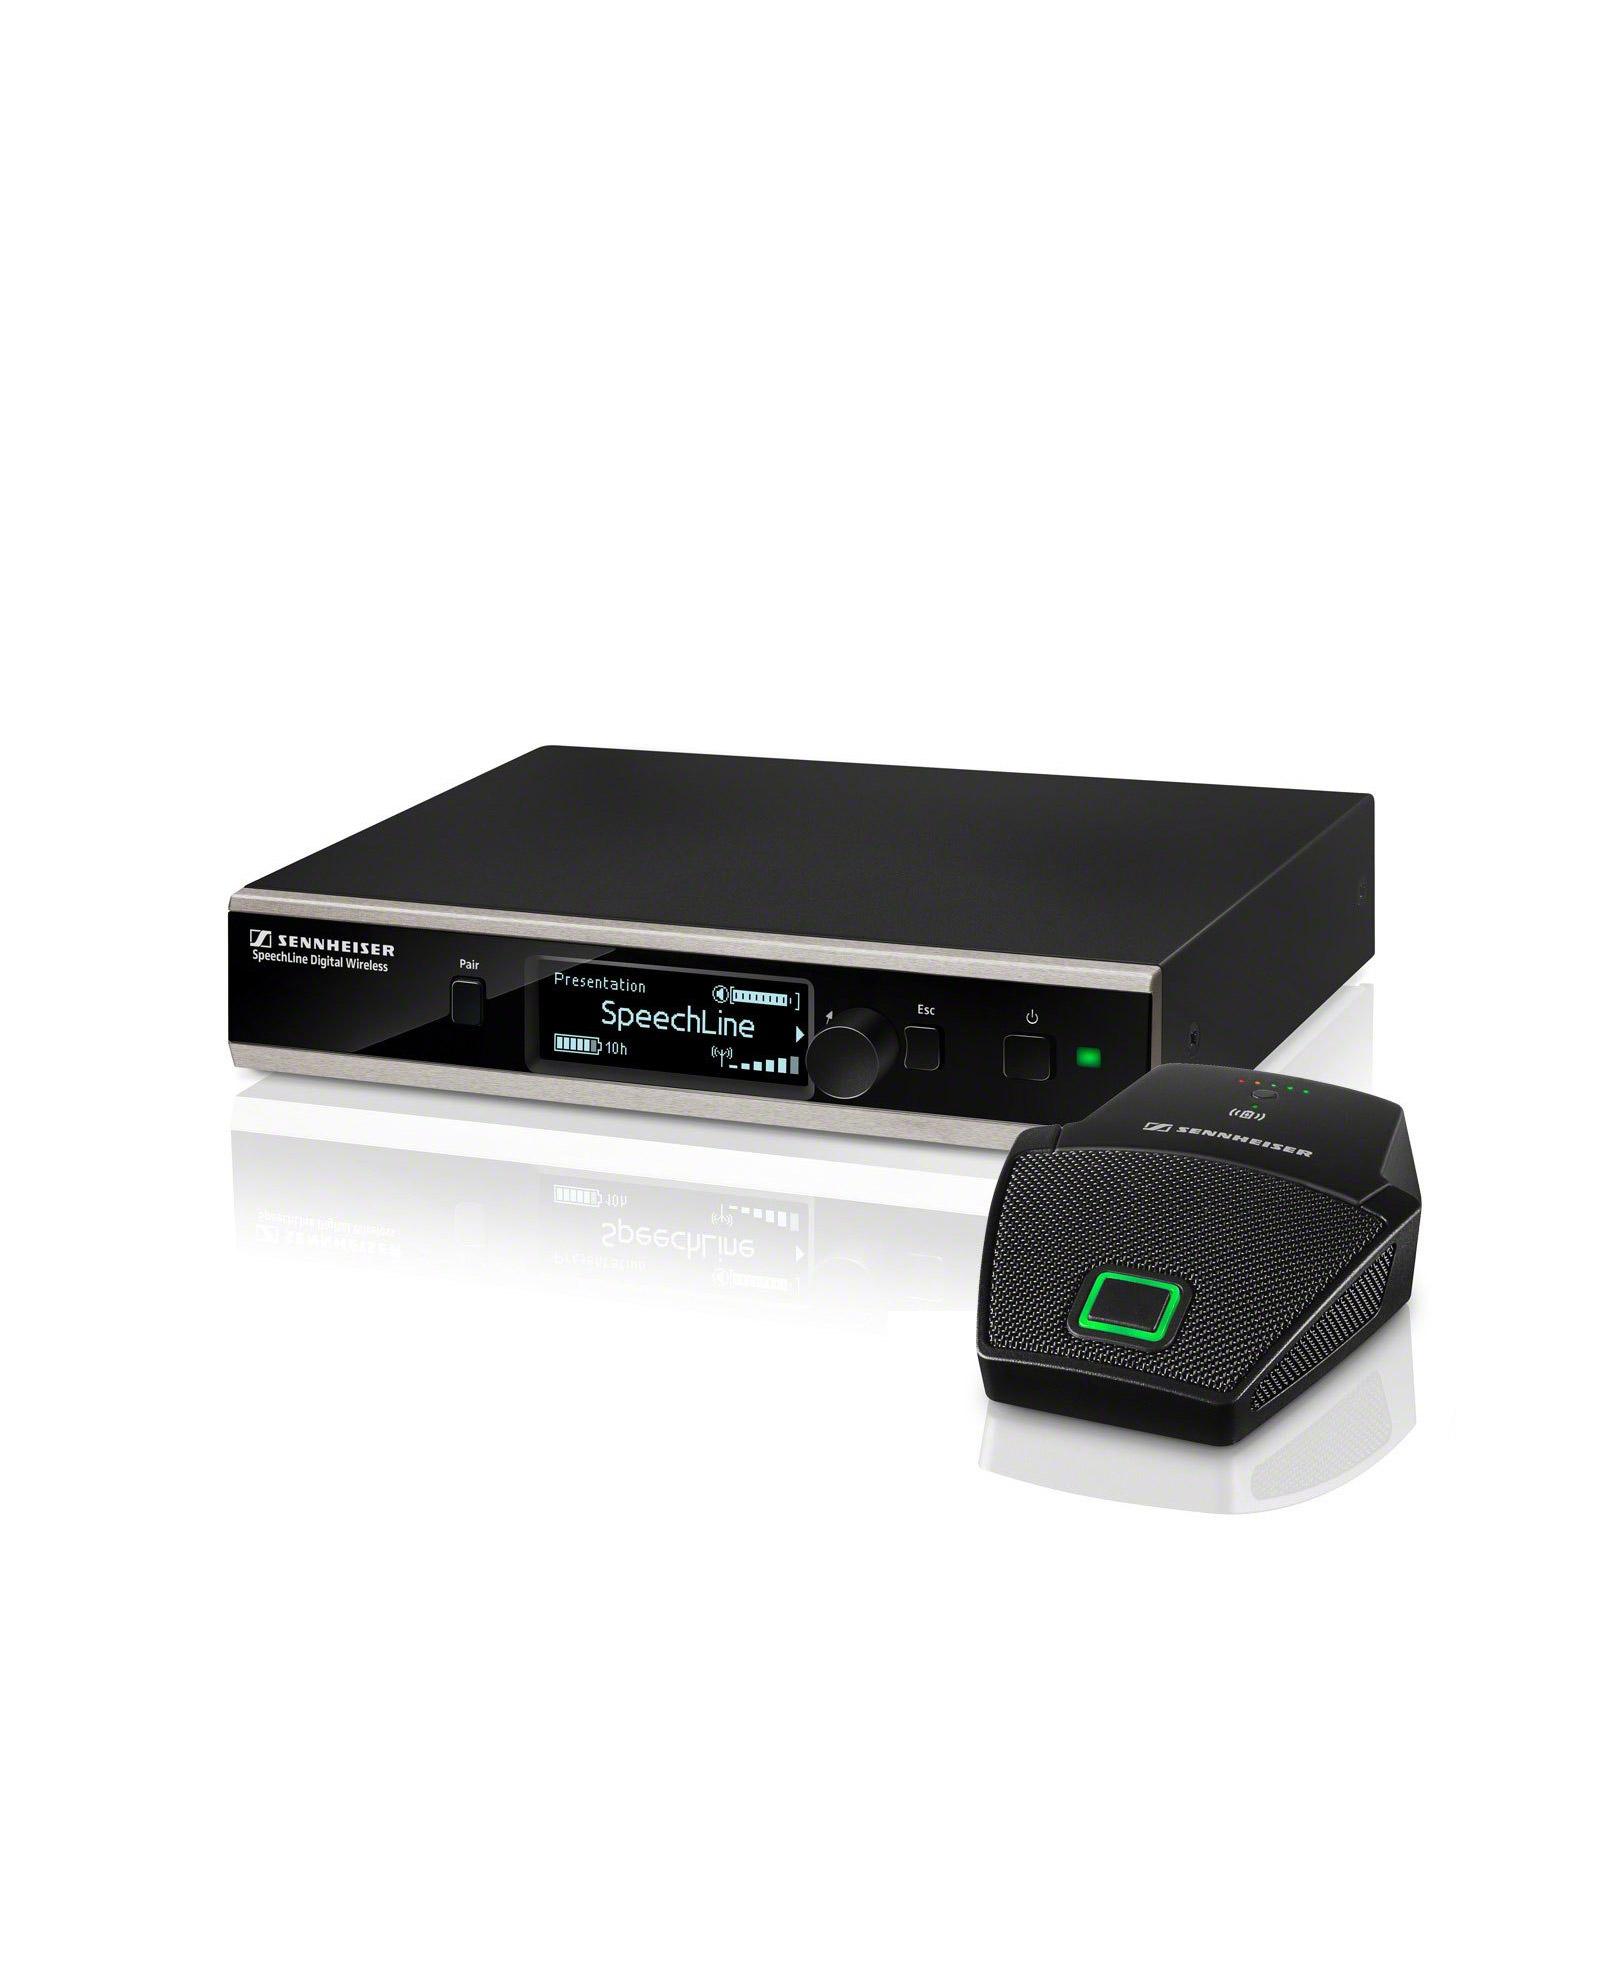 Sennheiser Speechline Boundary Set Dw 3 Wireless Microphone System